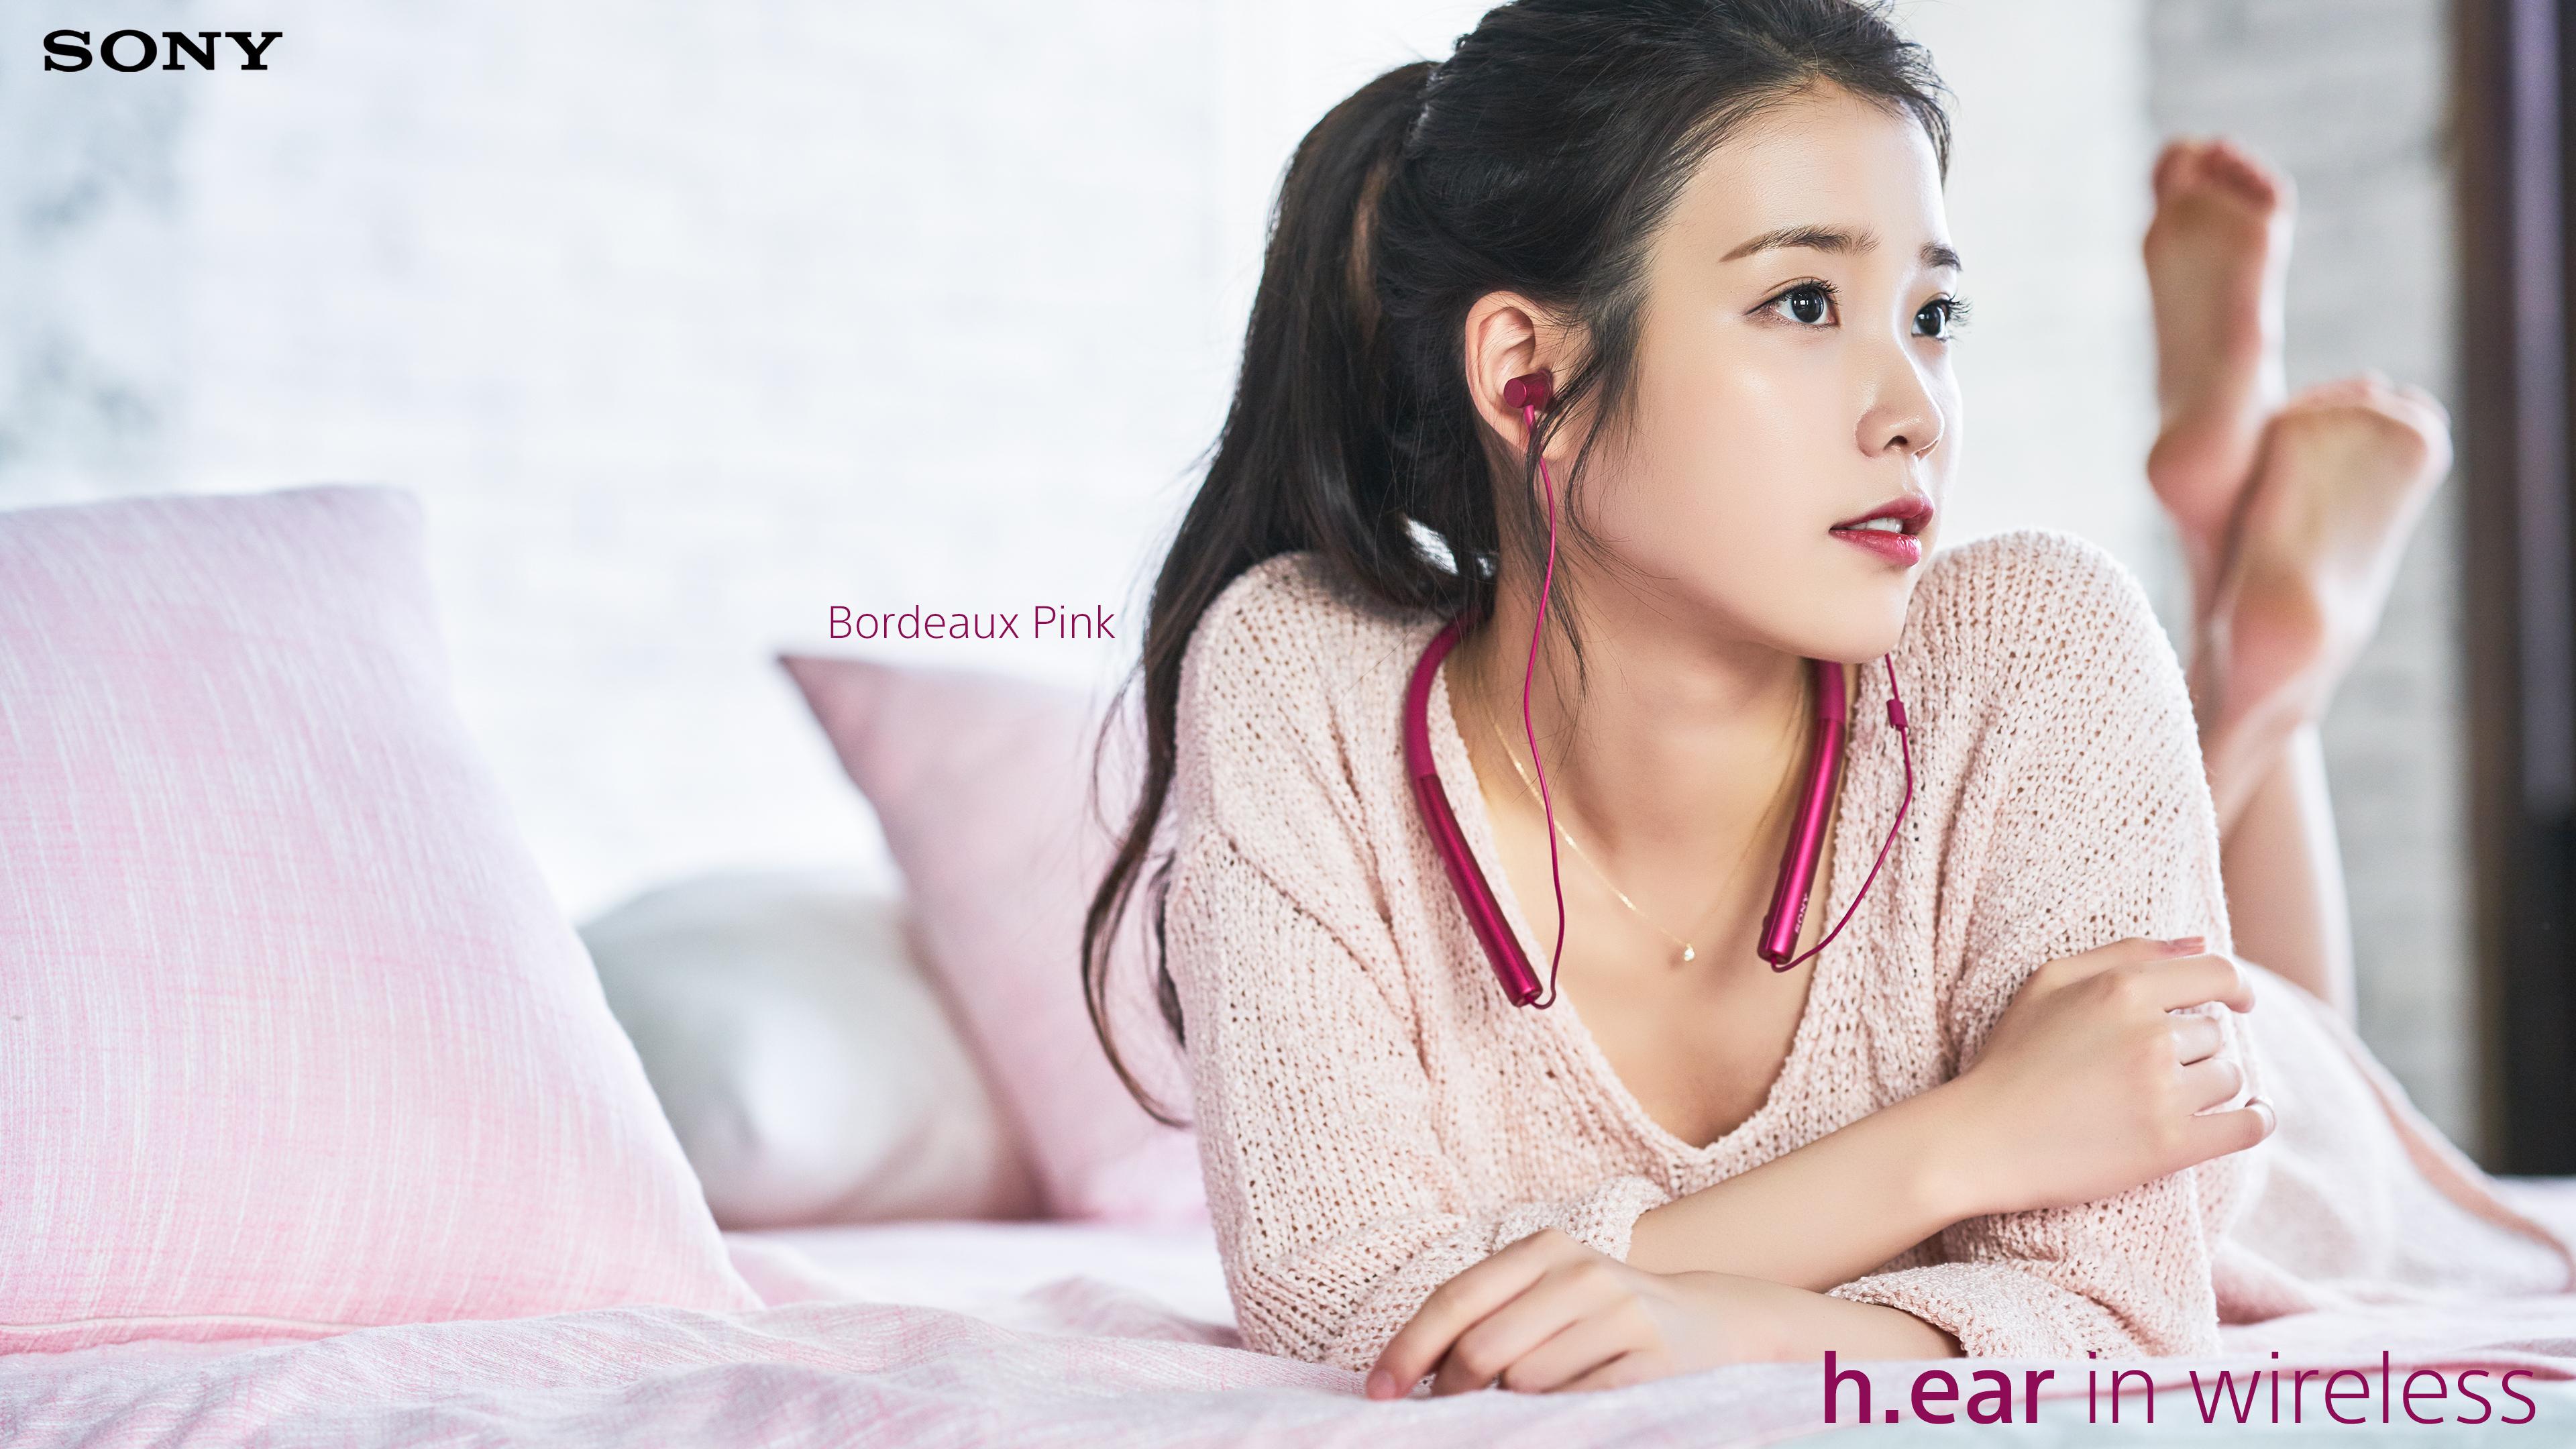 160419 IU for Sony Korea 보르도 핑크 Bordeaux Pink